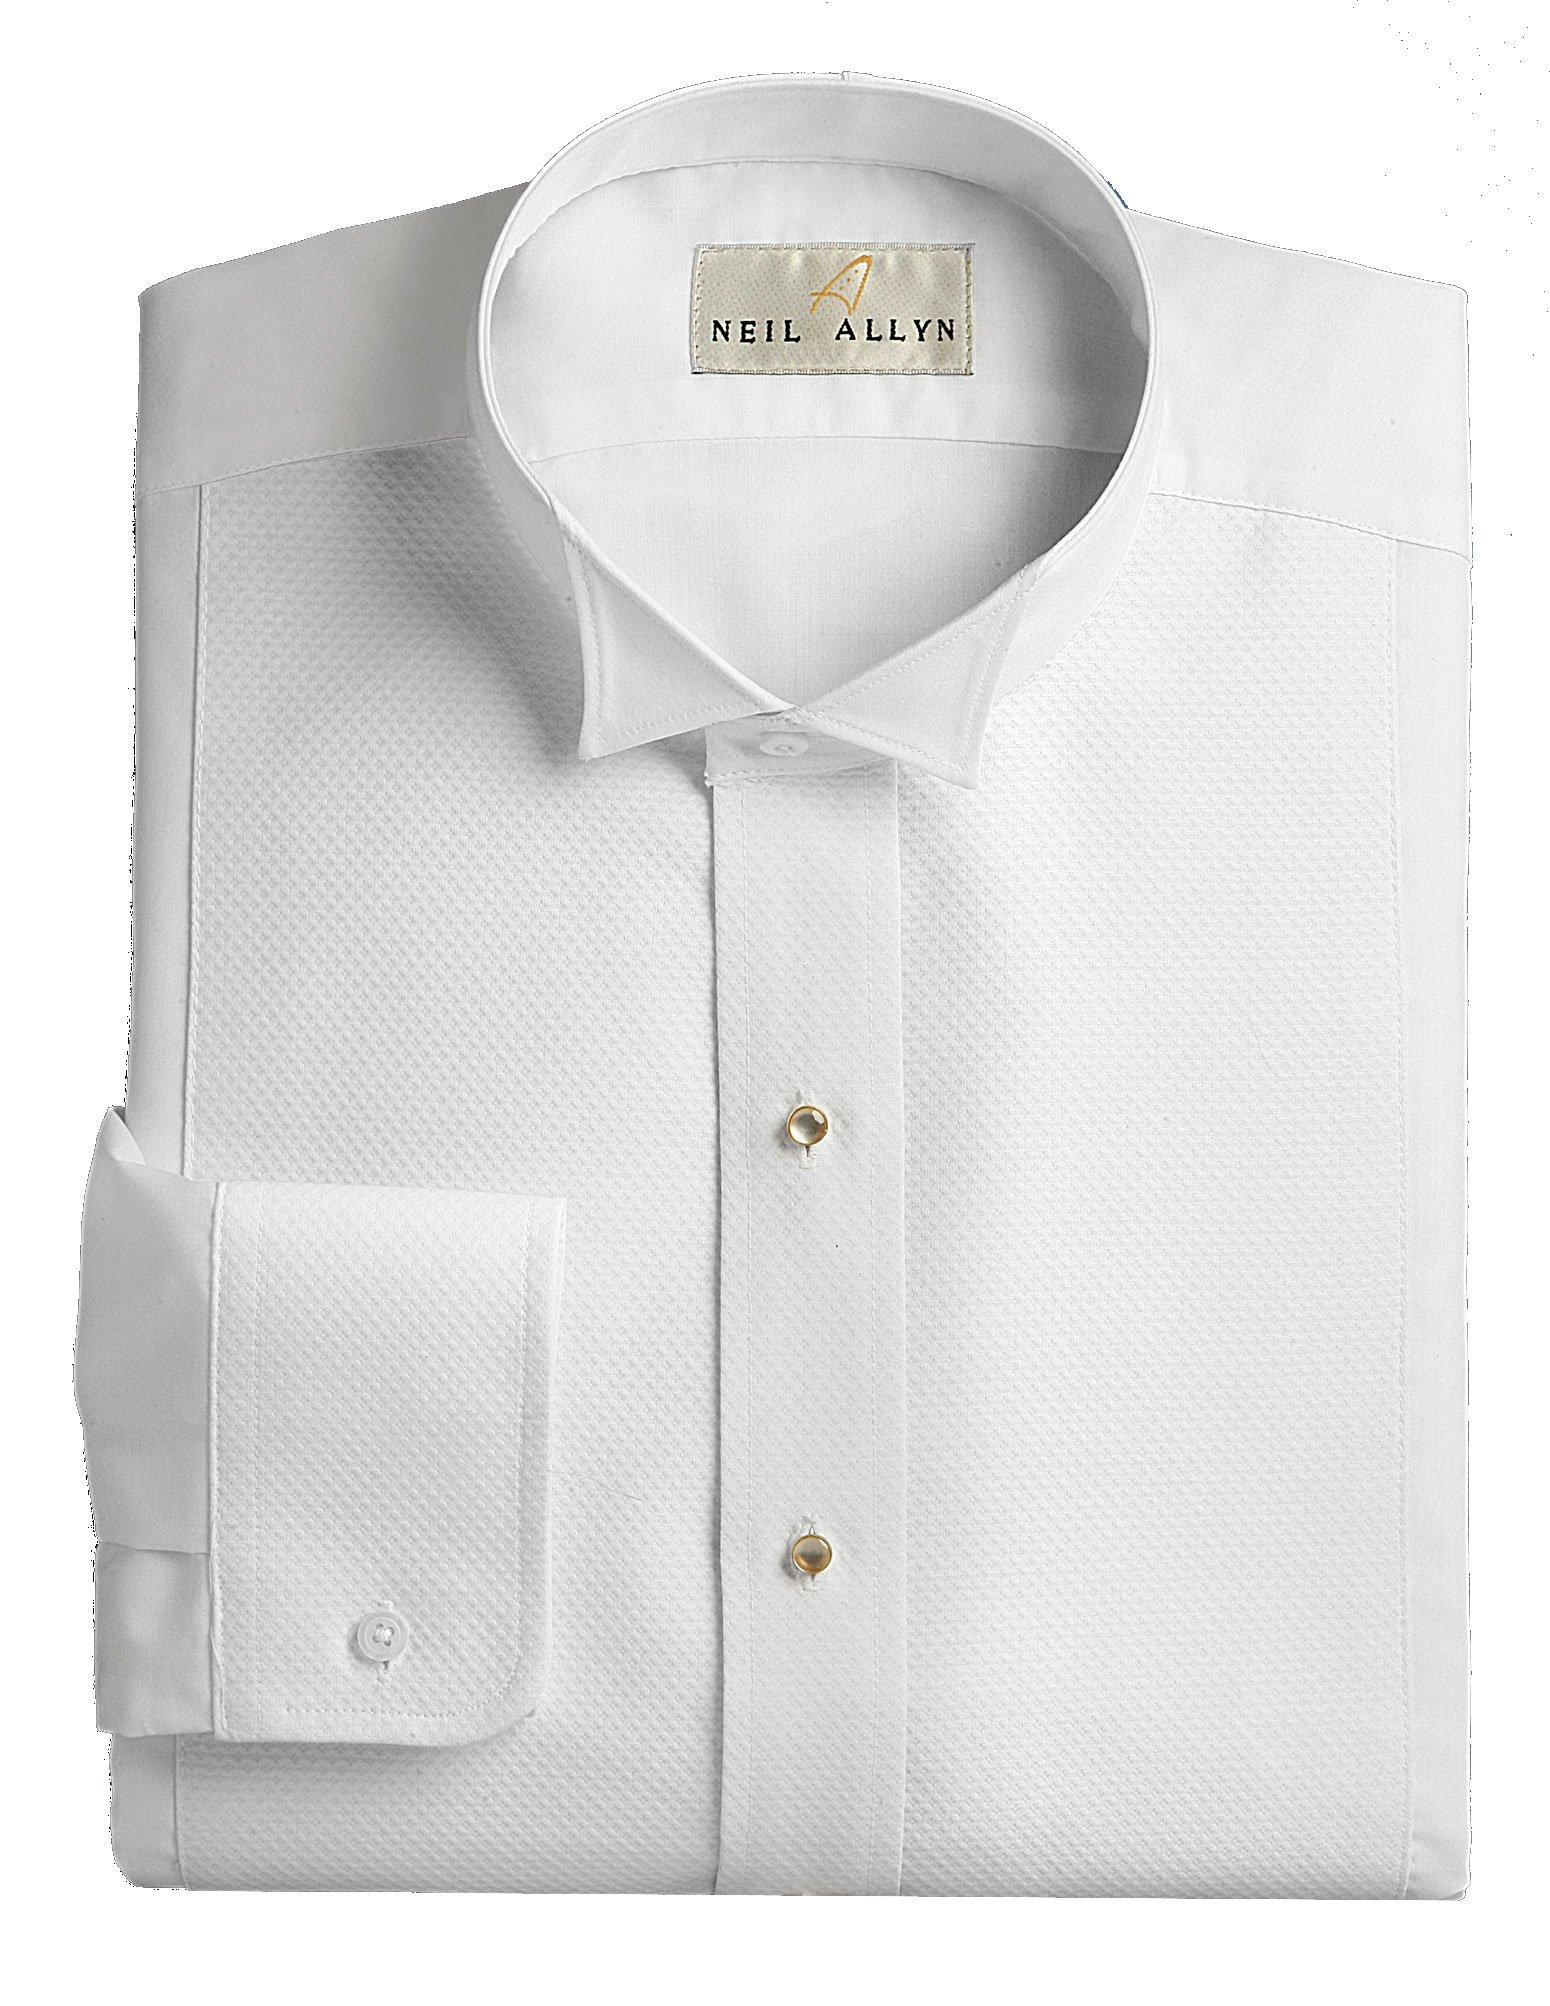 Wing Collar Tuxedo Shirt, Pique Bib Front, 65% Polyester 35% Cotton White (15.5 - 32/33)